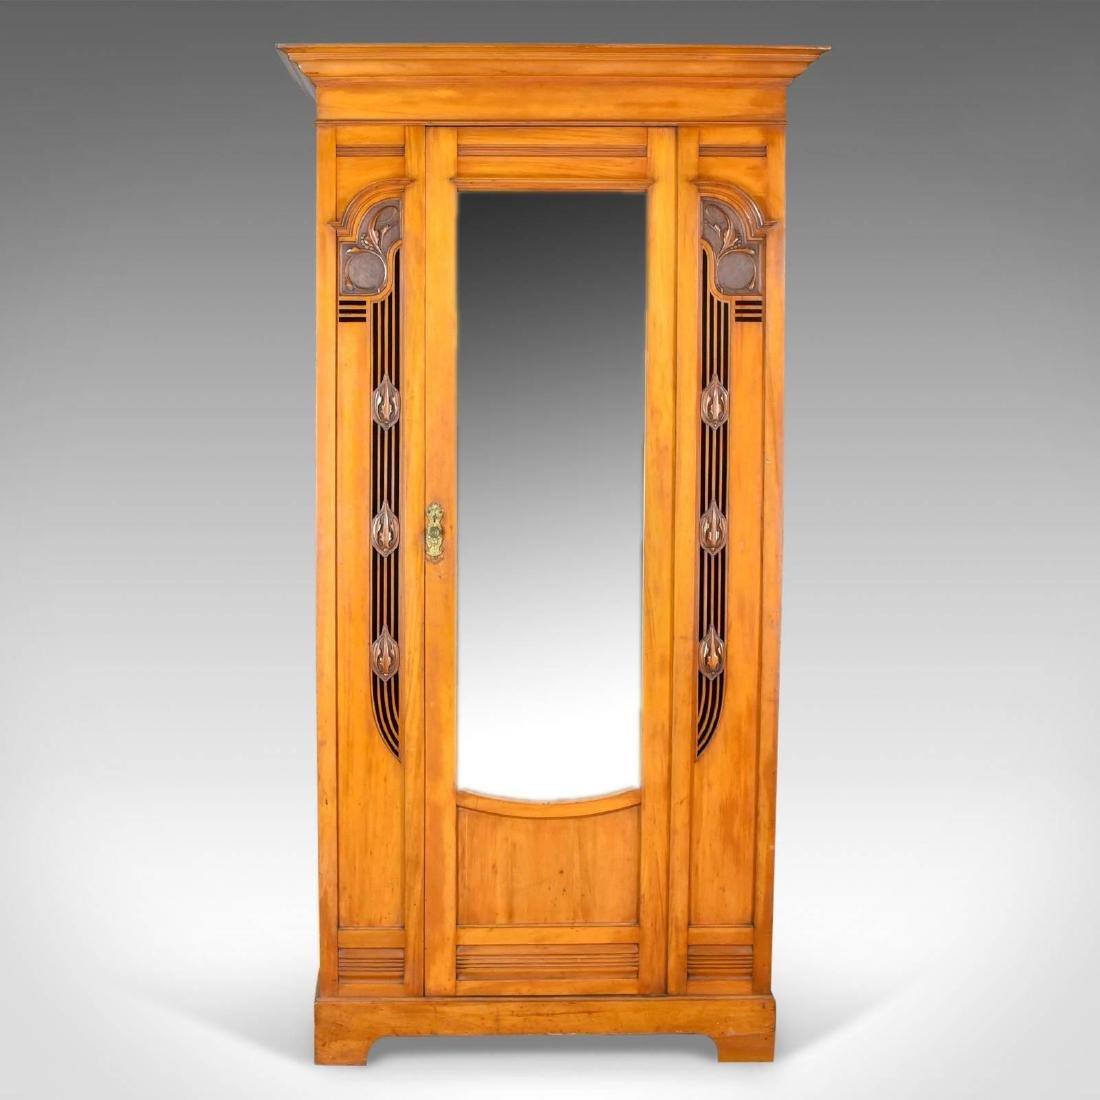 Antique Single Wardrobe, Satinwood, English, Compactum, - 2